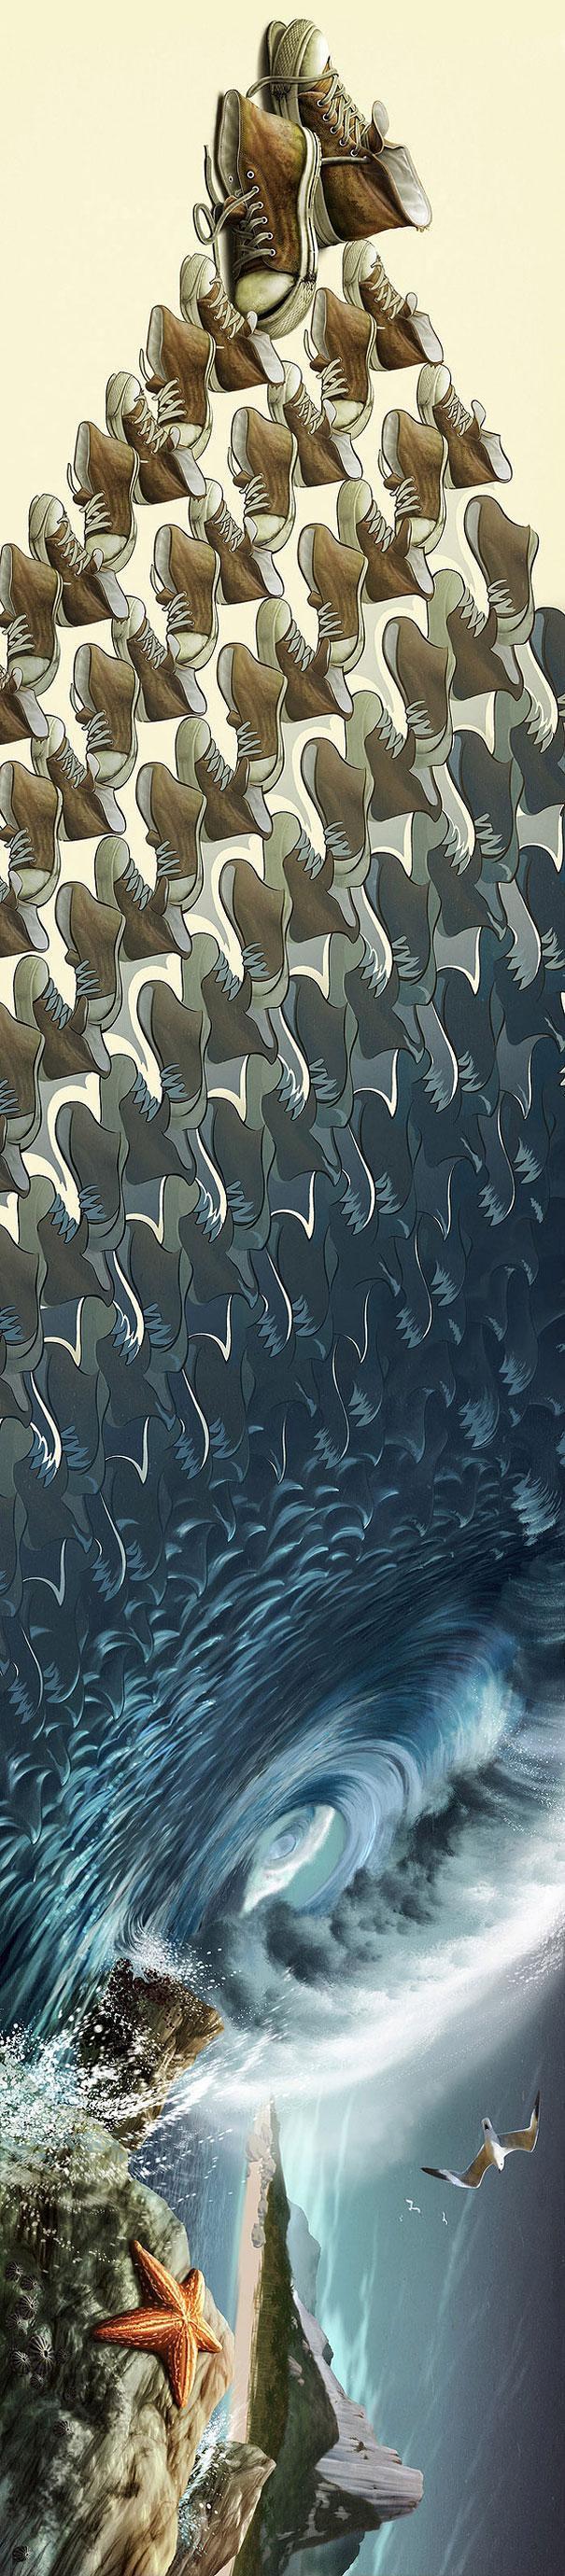 ad-plus-illustrations-oscar-ramos-5.jpg